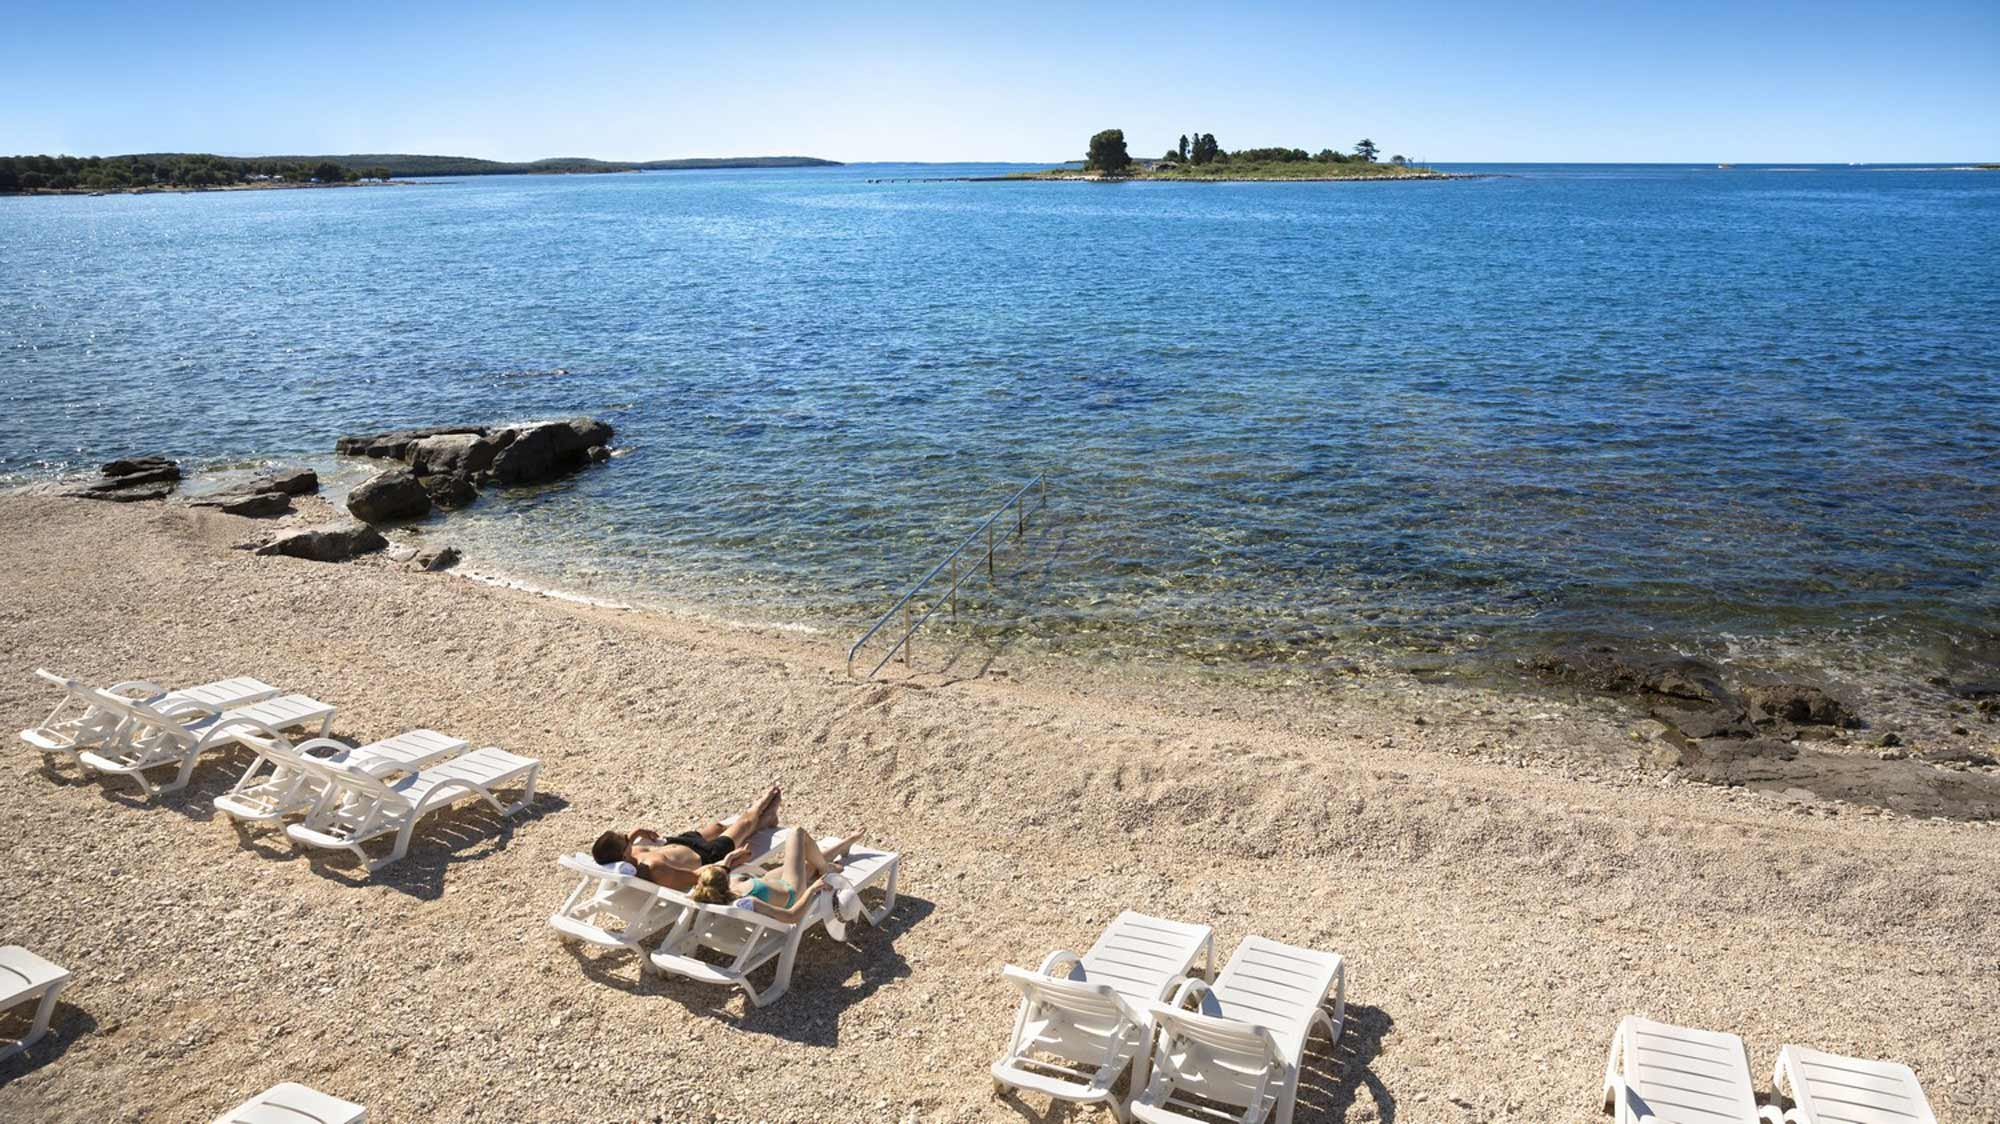 Strand rovinj fkk Freikörperkultur an